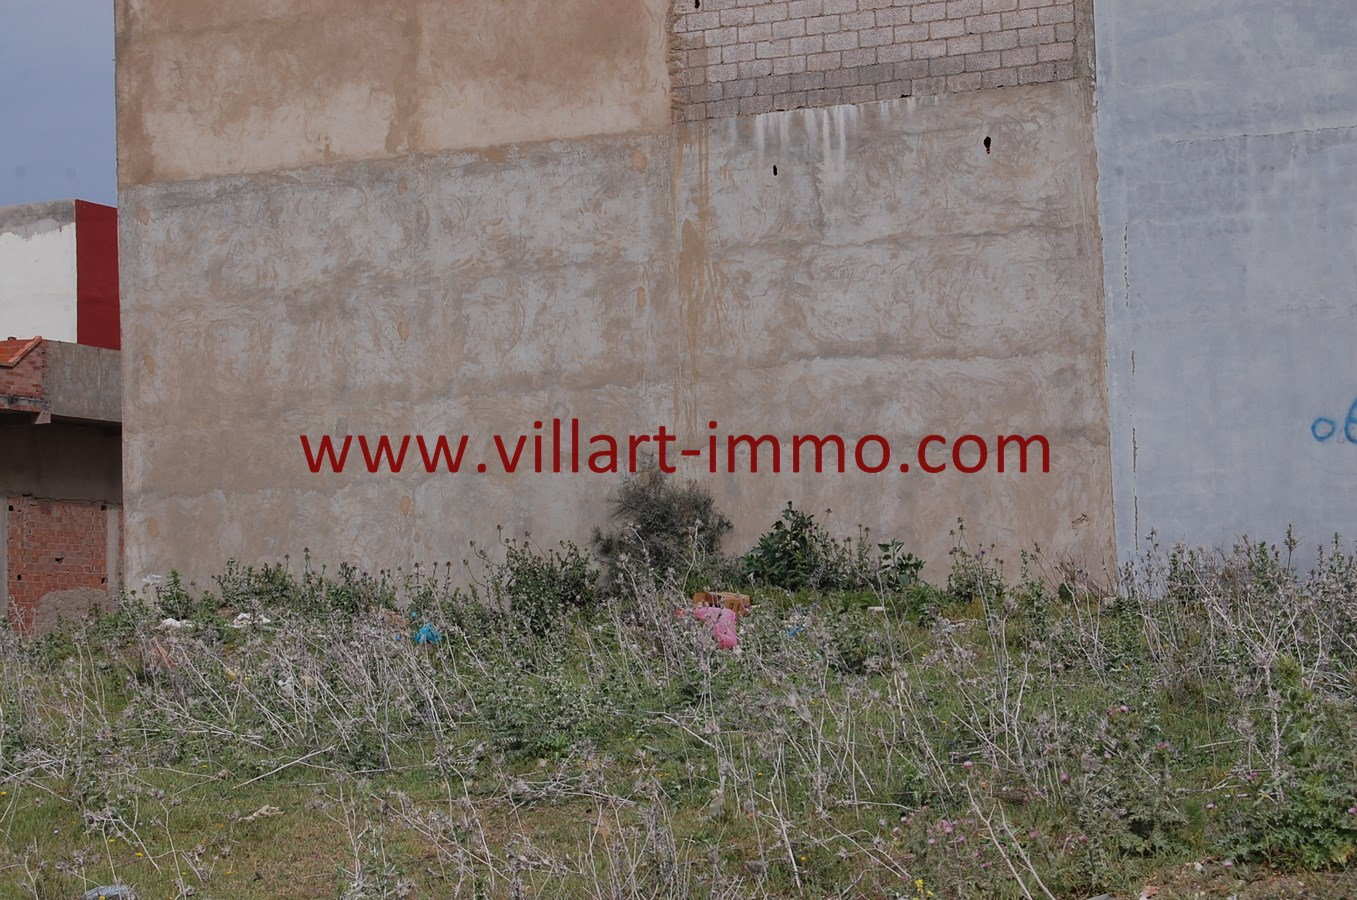 1-Vente-Terrain-Tanger-Gzenaya-VT28-Villart Immo